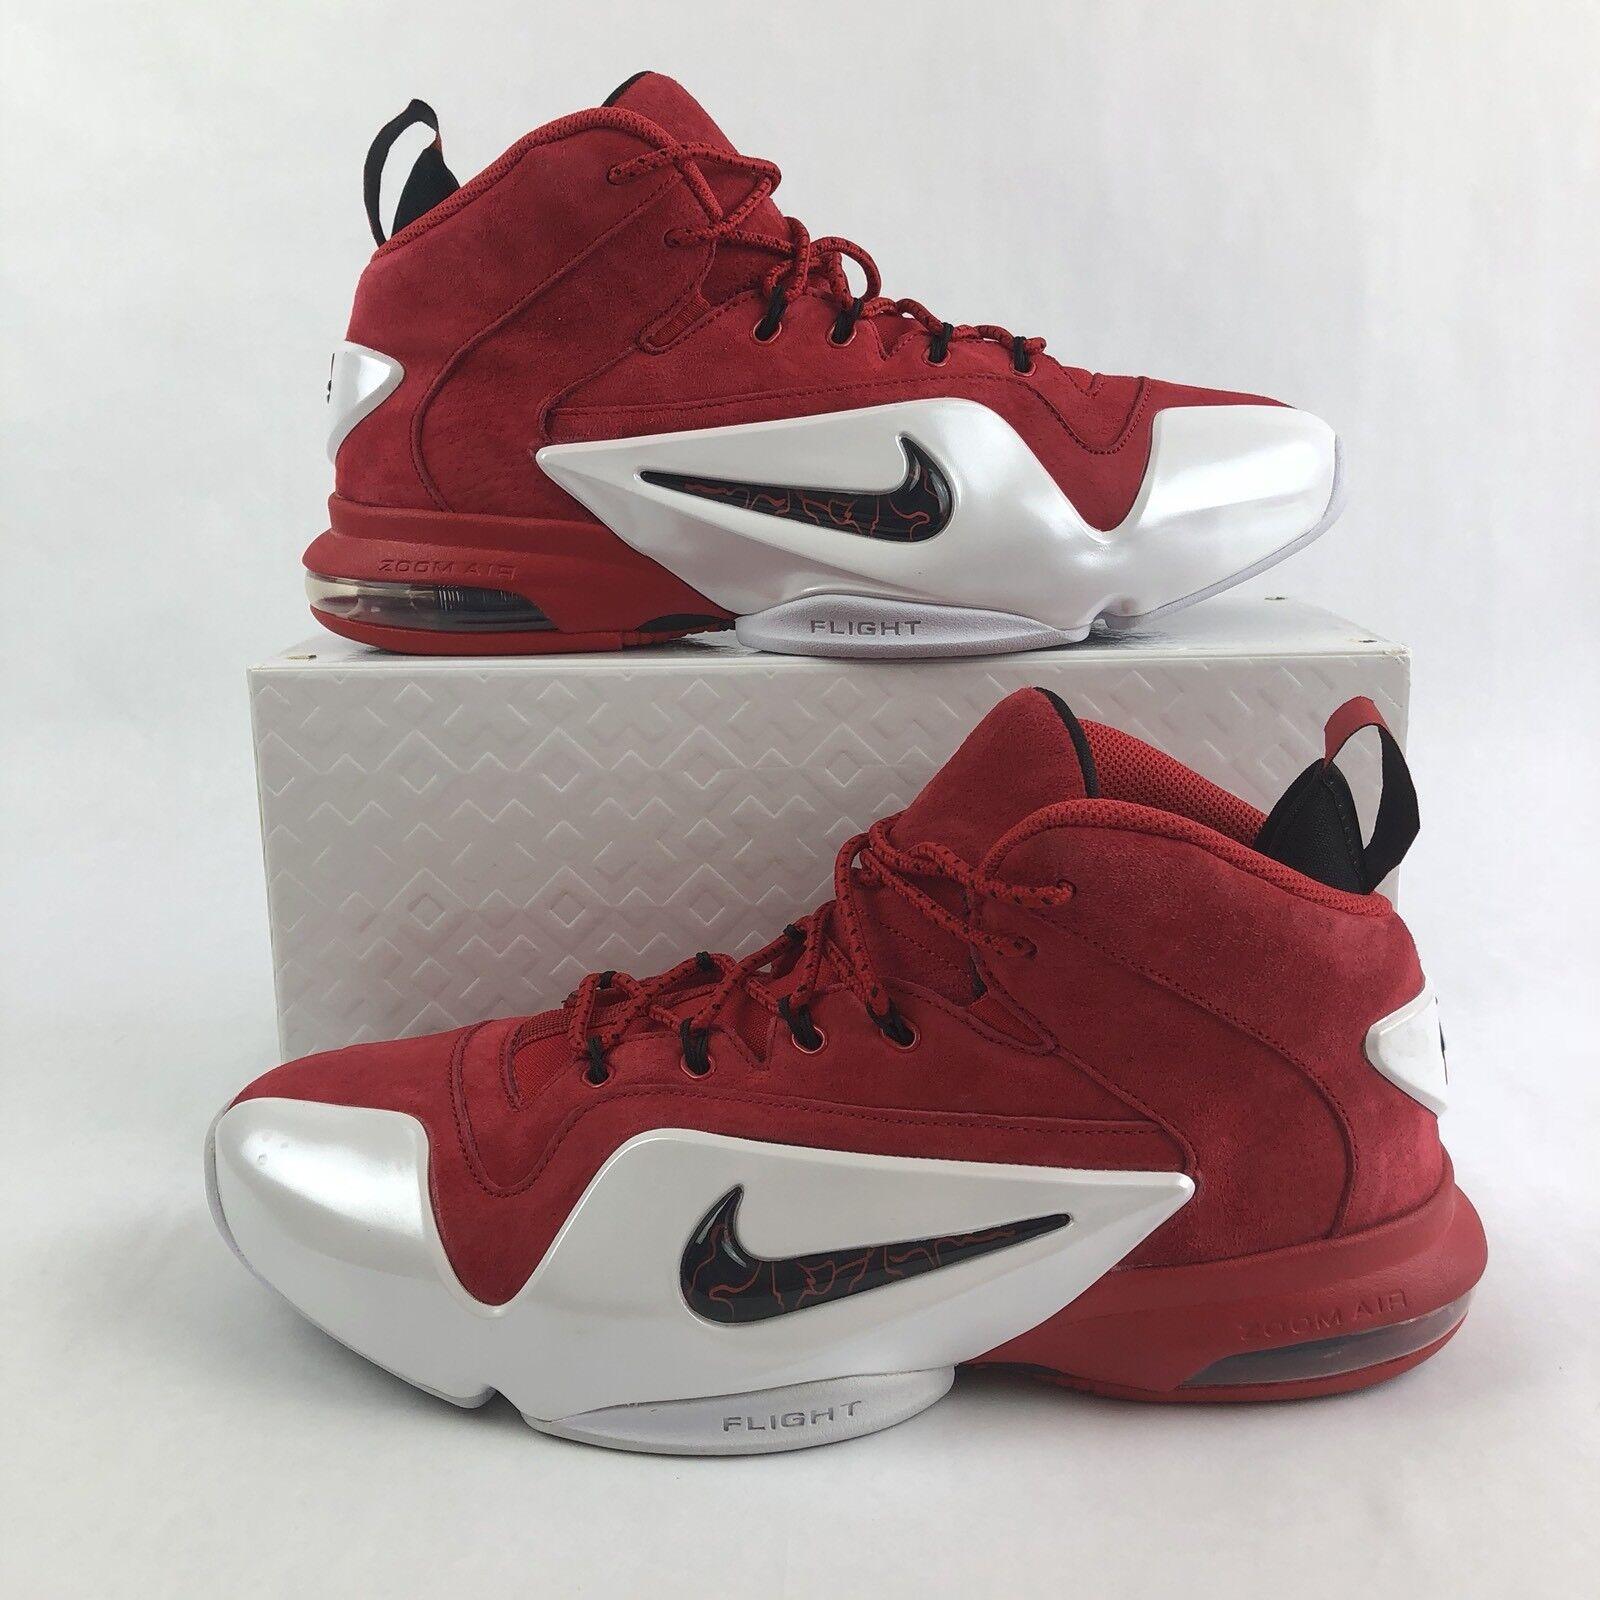 Nike Zoom Penny VI 6 University rouge/noir-blanc 749629-600 homme Sz 10.5